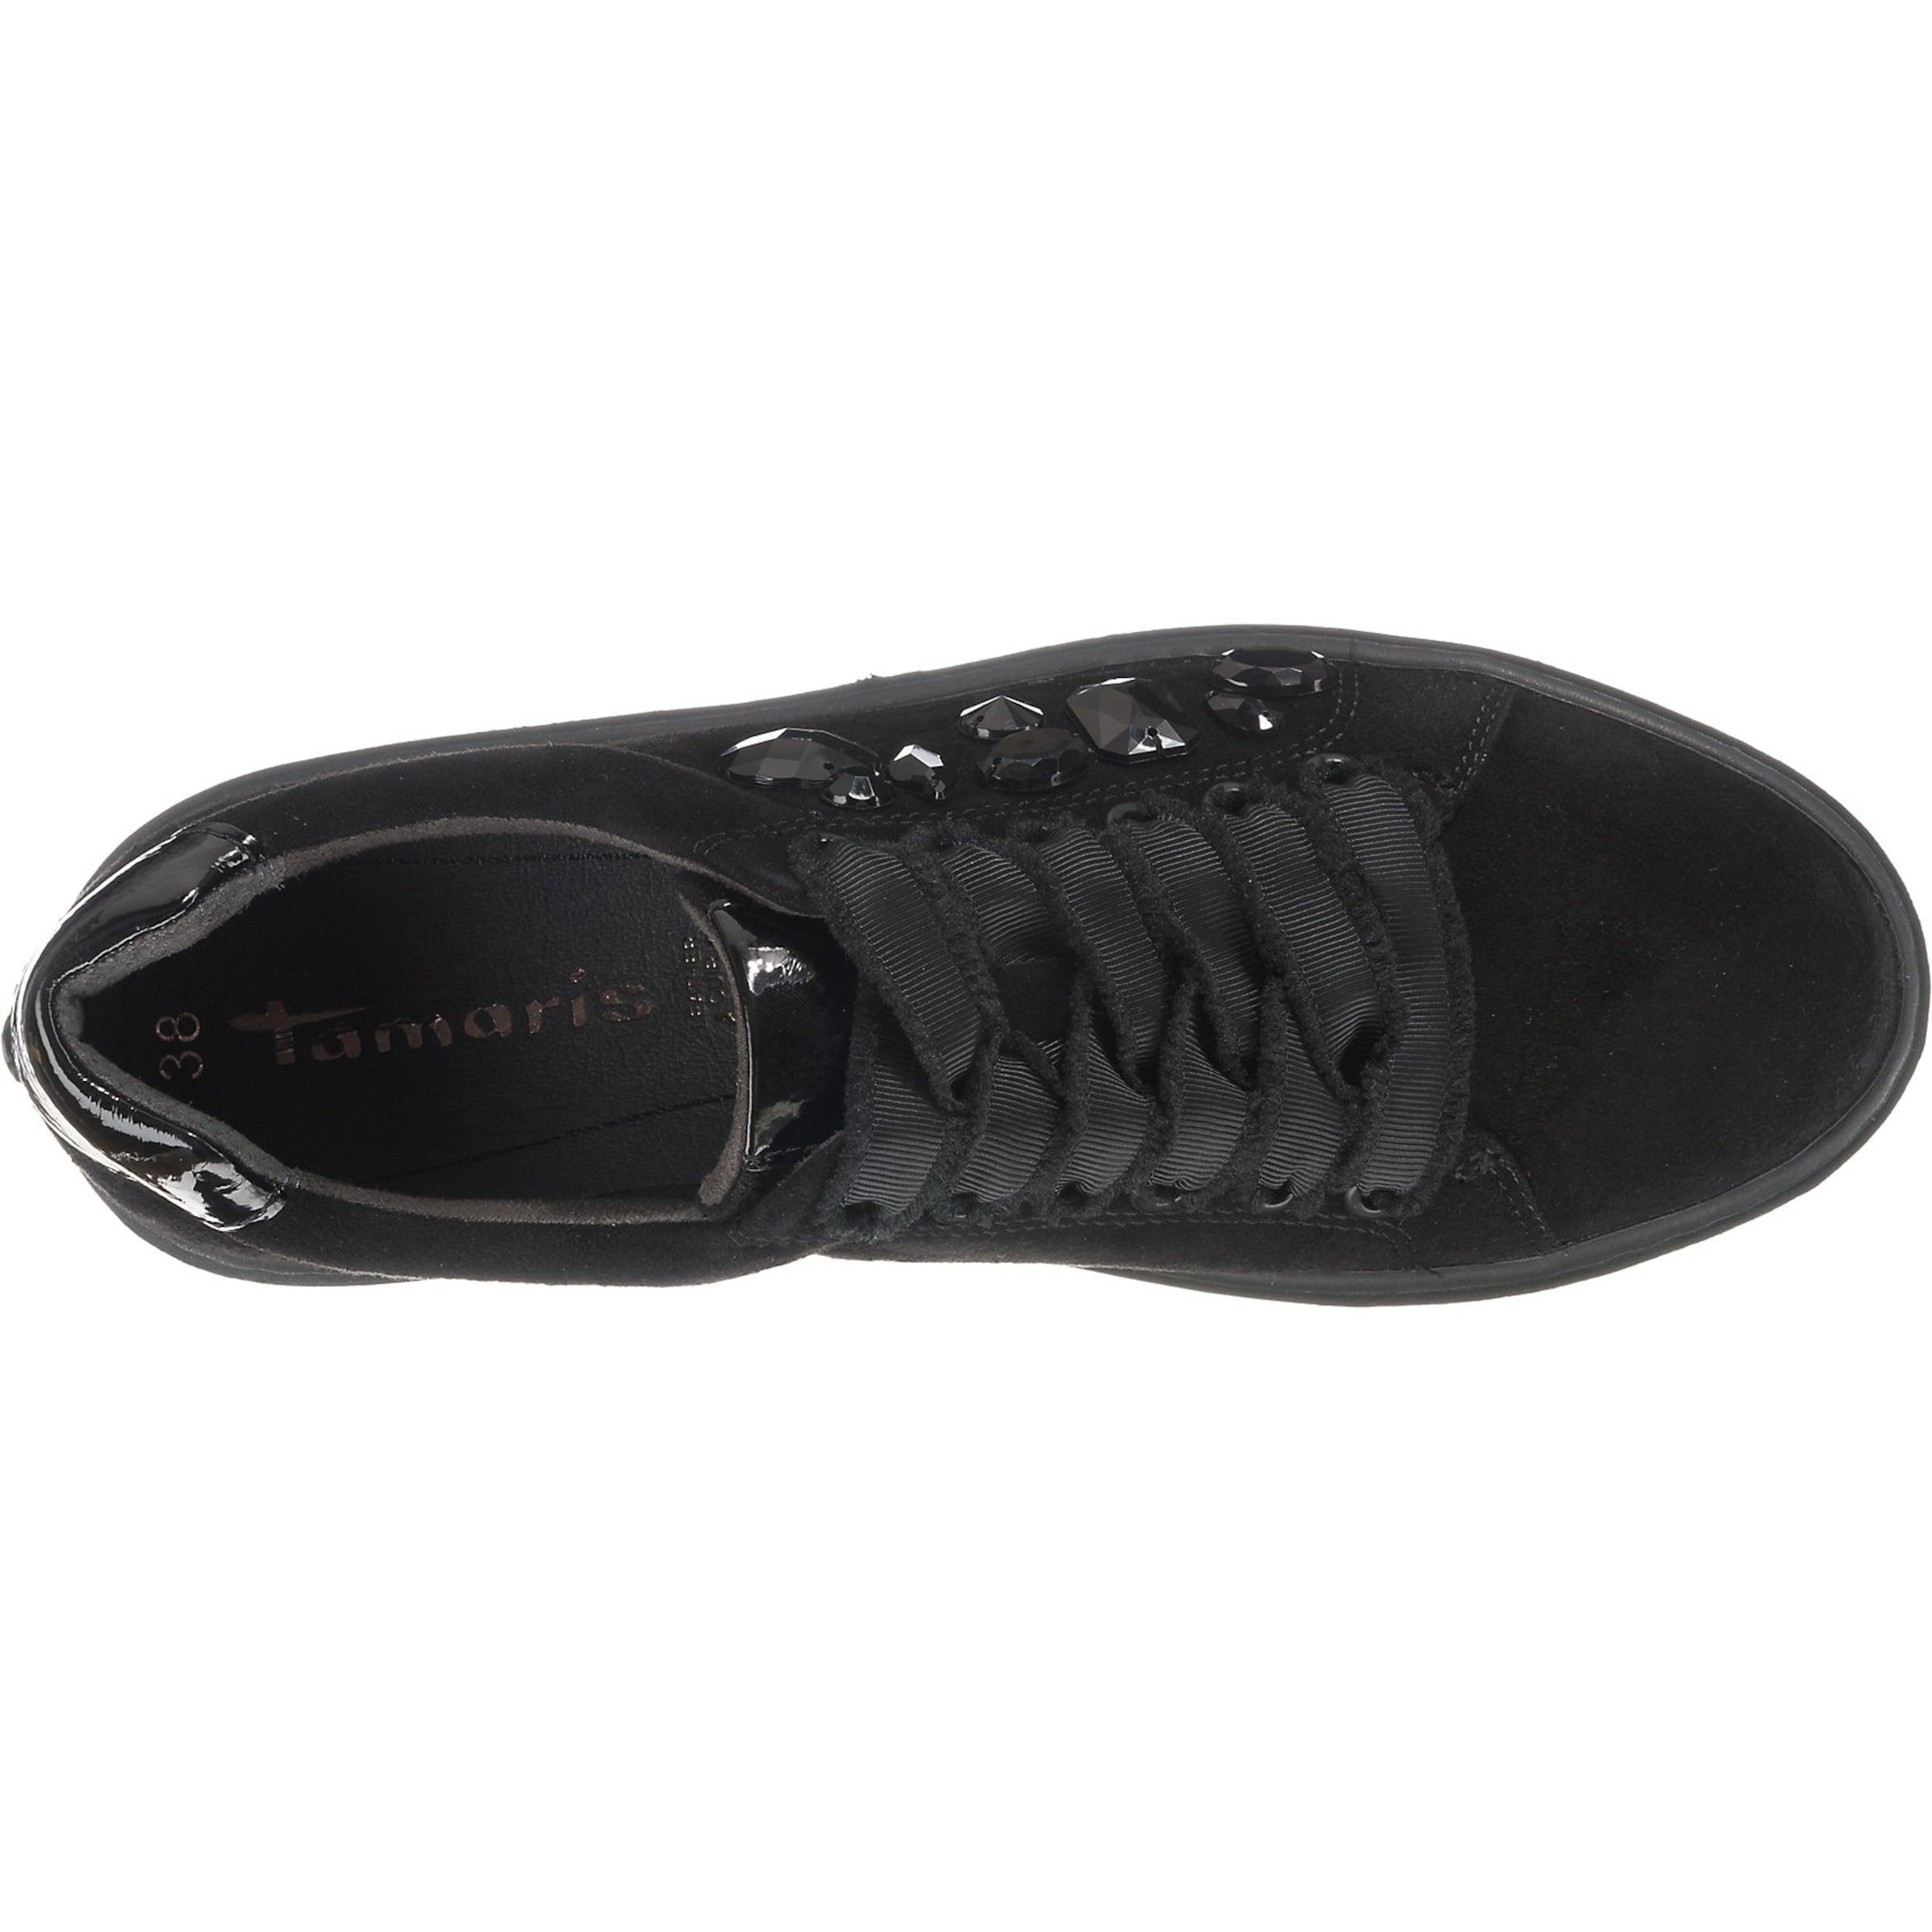 Tamaris In Tamaris Schwarz Schwarz Tamaris Sneakers Sneakers Low Low In 6fgYb7yv